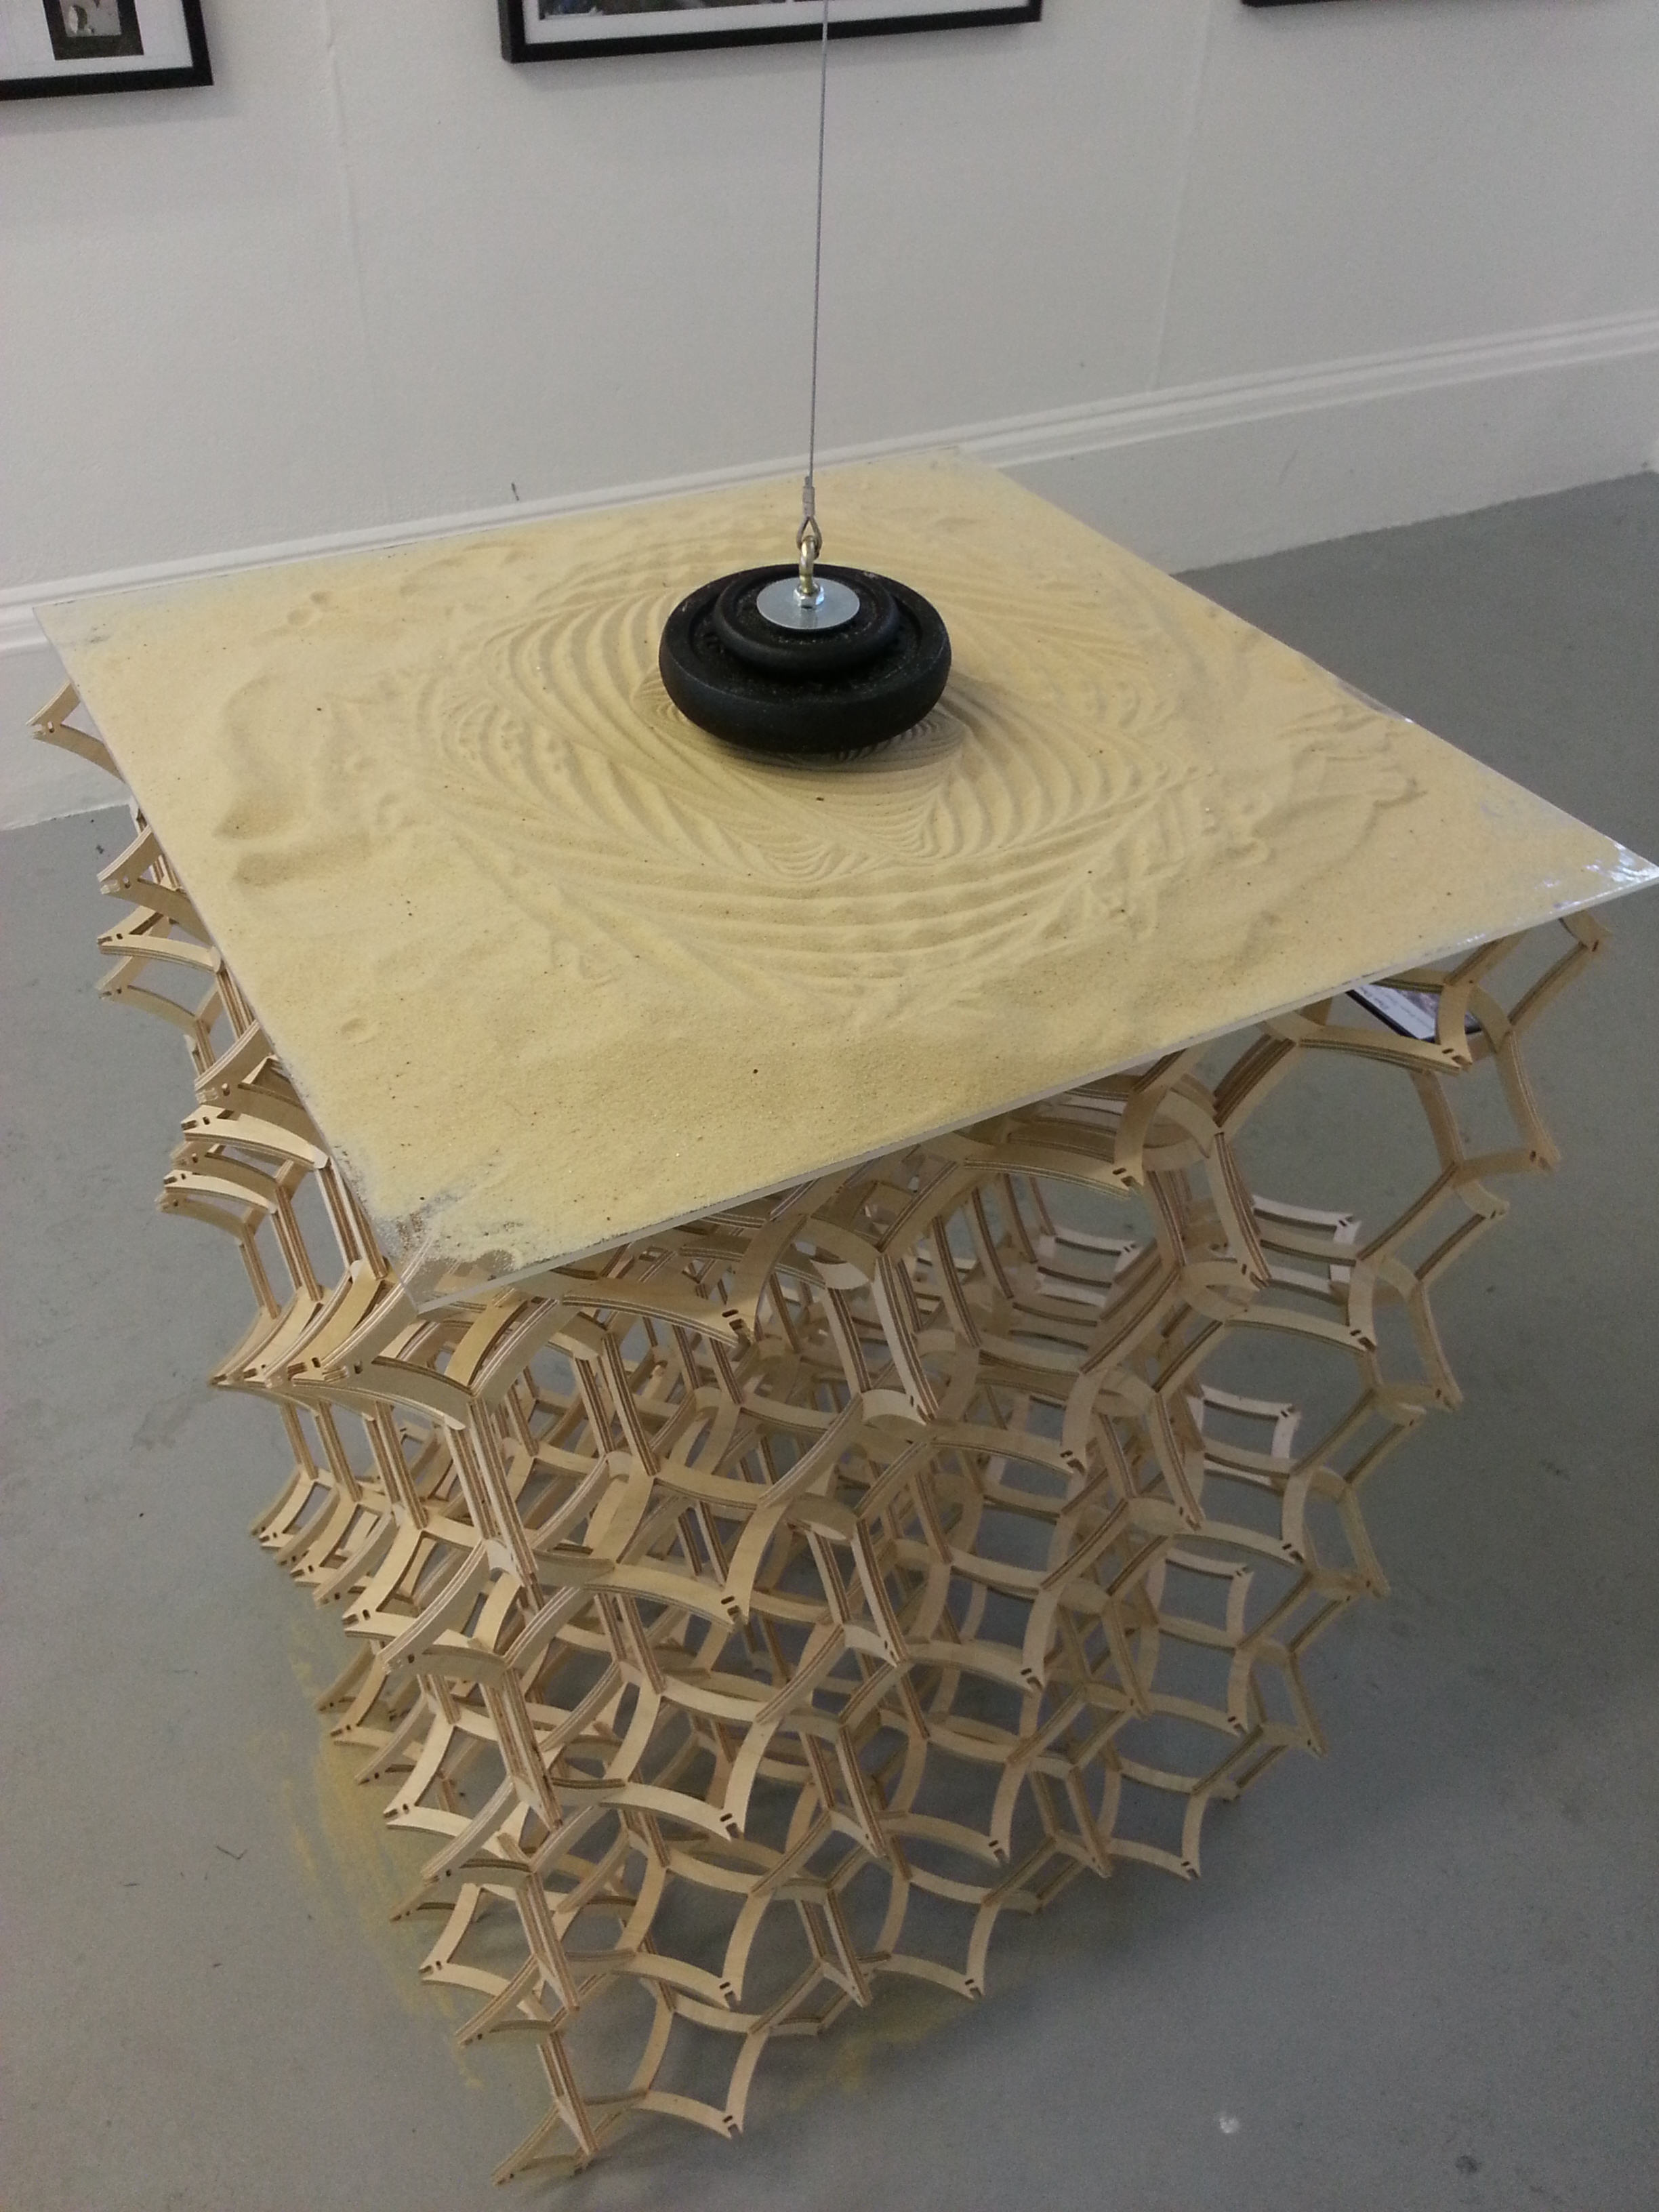 Dan Dodds Pendulum on CNC milled table